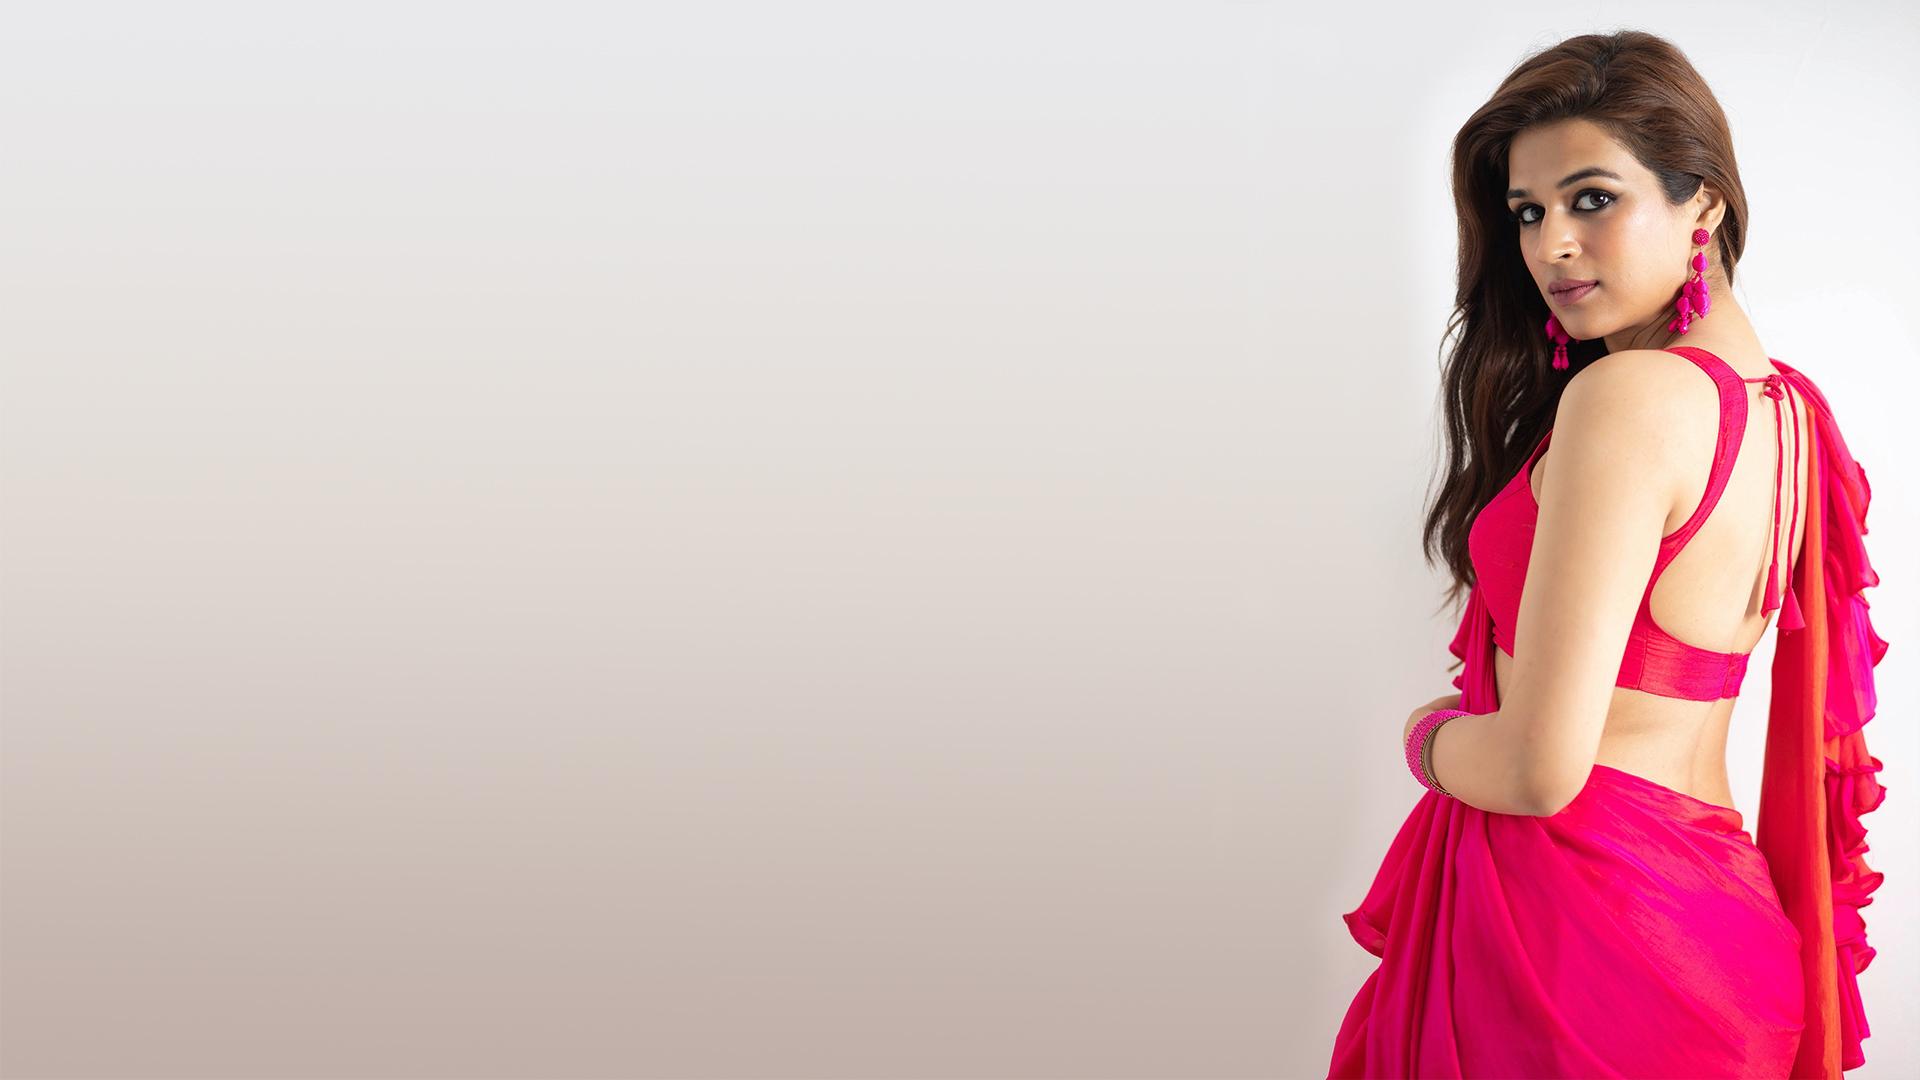 Wallpaper Shraddha Das Bollywood Actresses Actress Celebrity Backless Seduce Sensual Gaze Red Saree Blouse 1920x1080 Askme 1685353 Hd Wallpapers Wallhere